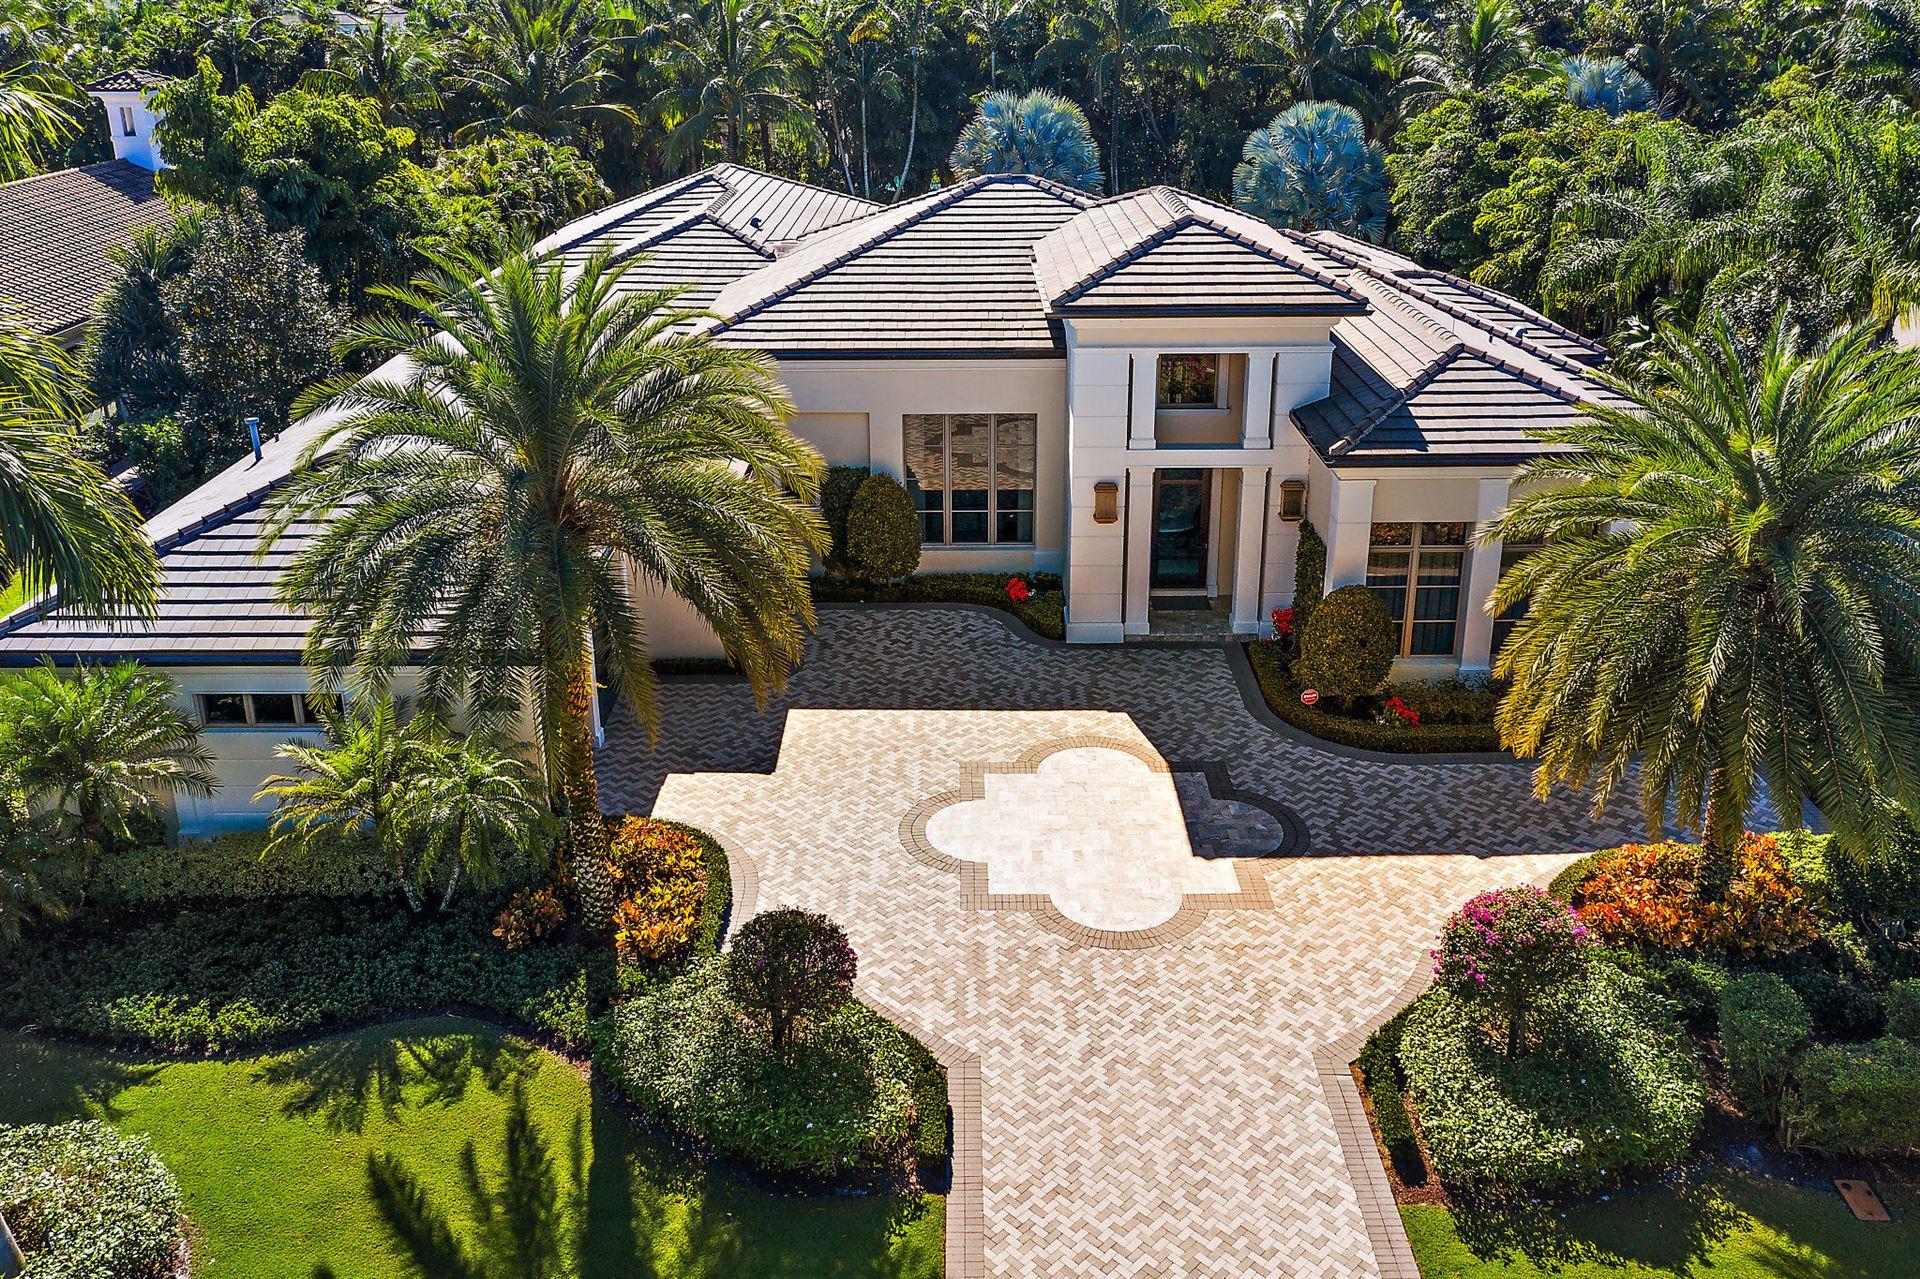 11774 Calleta Court, Palm Beach Gardens, FL 33418 - #: RX-10593303